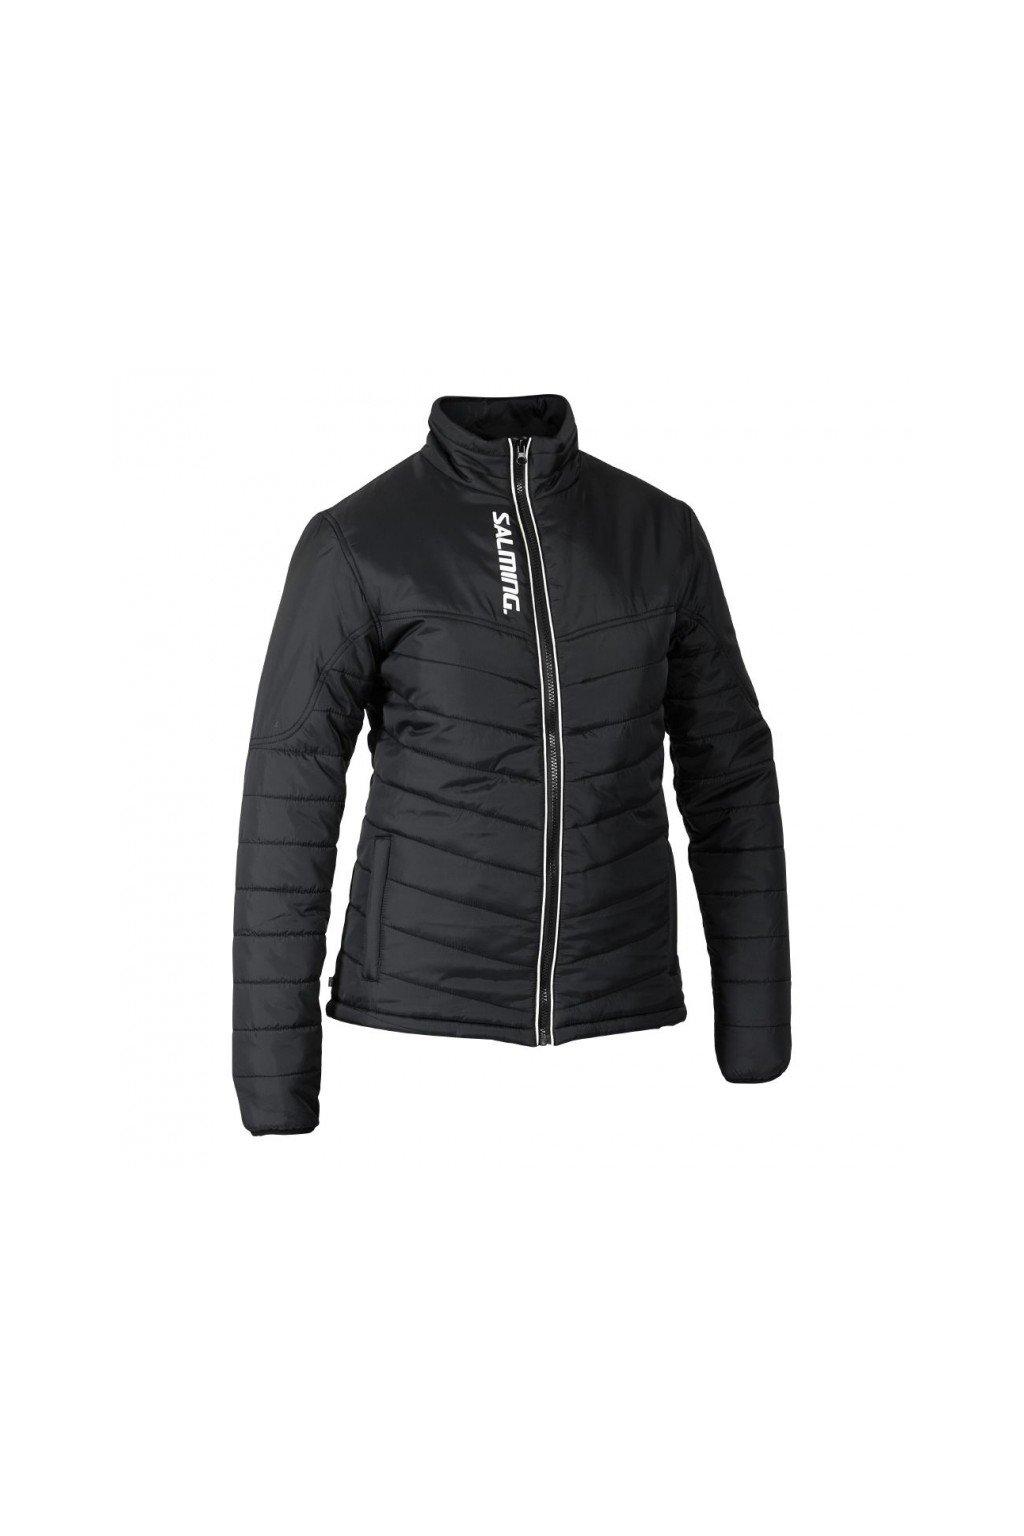 salming league jacket women black xxl